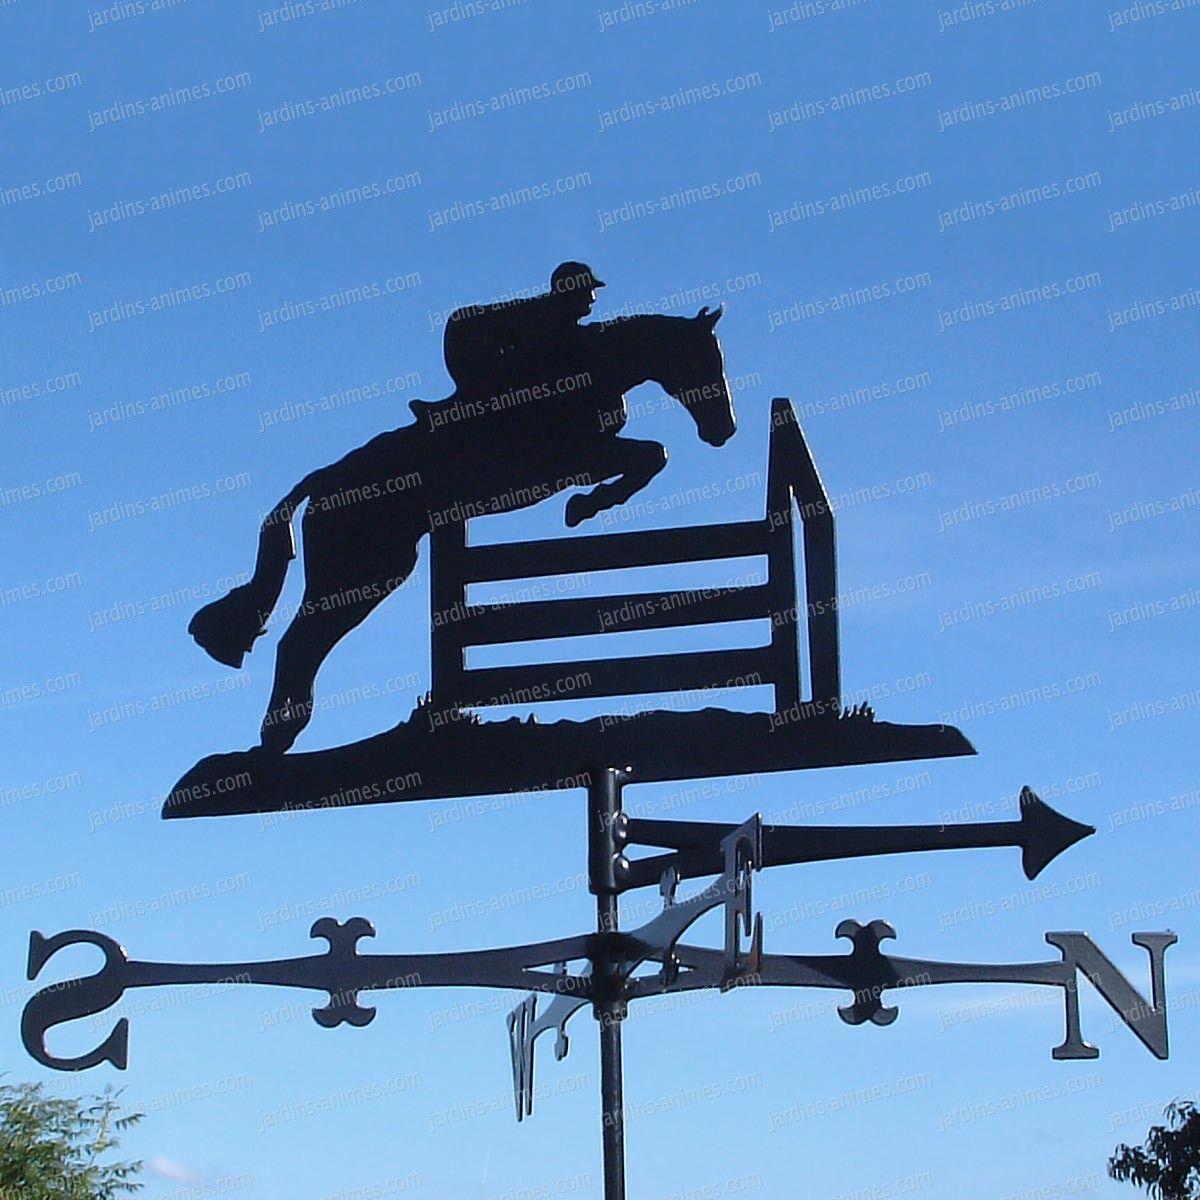 Girouette 50 Modèles Au Choix | Girouette, Peinture ... pour Girouette De Jardin